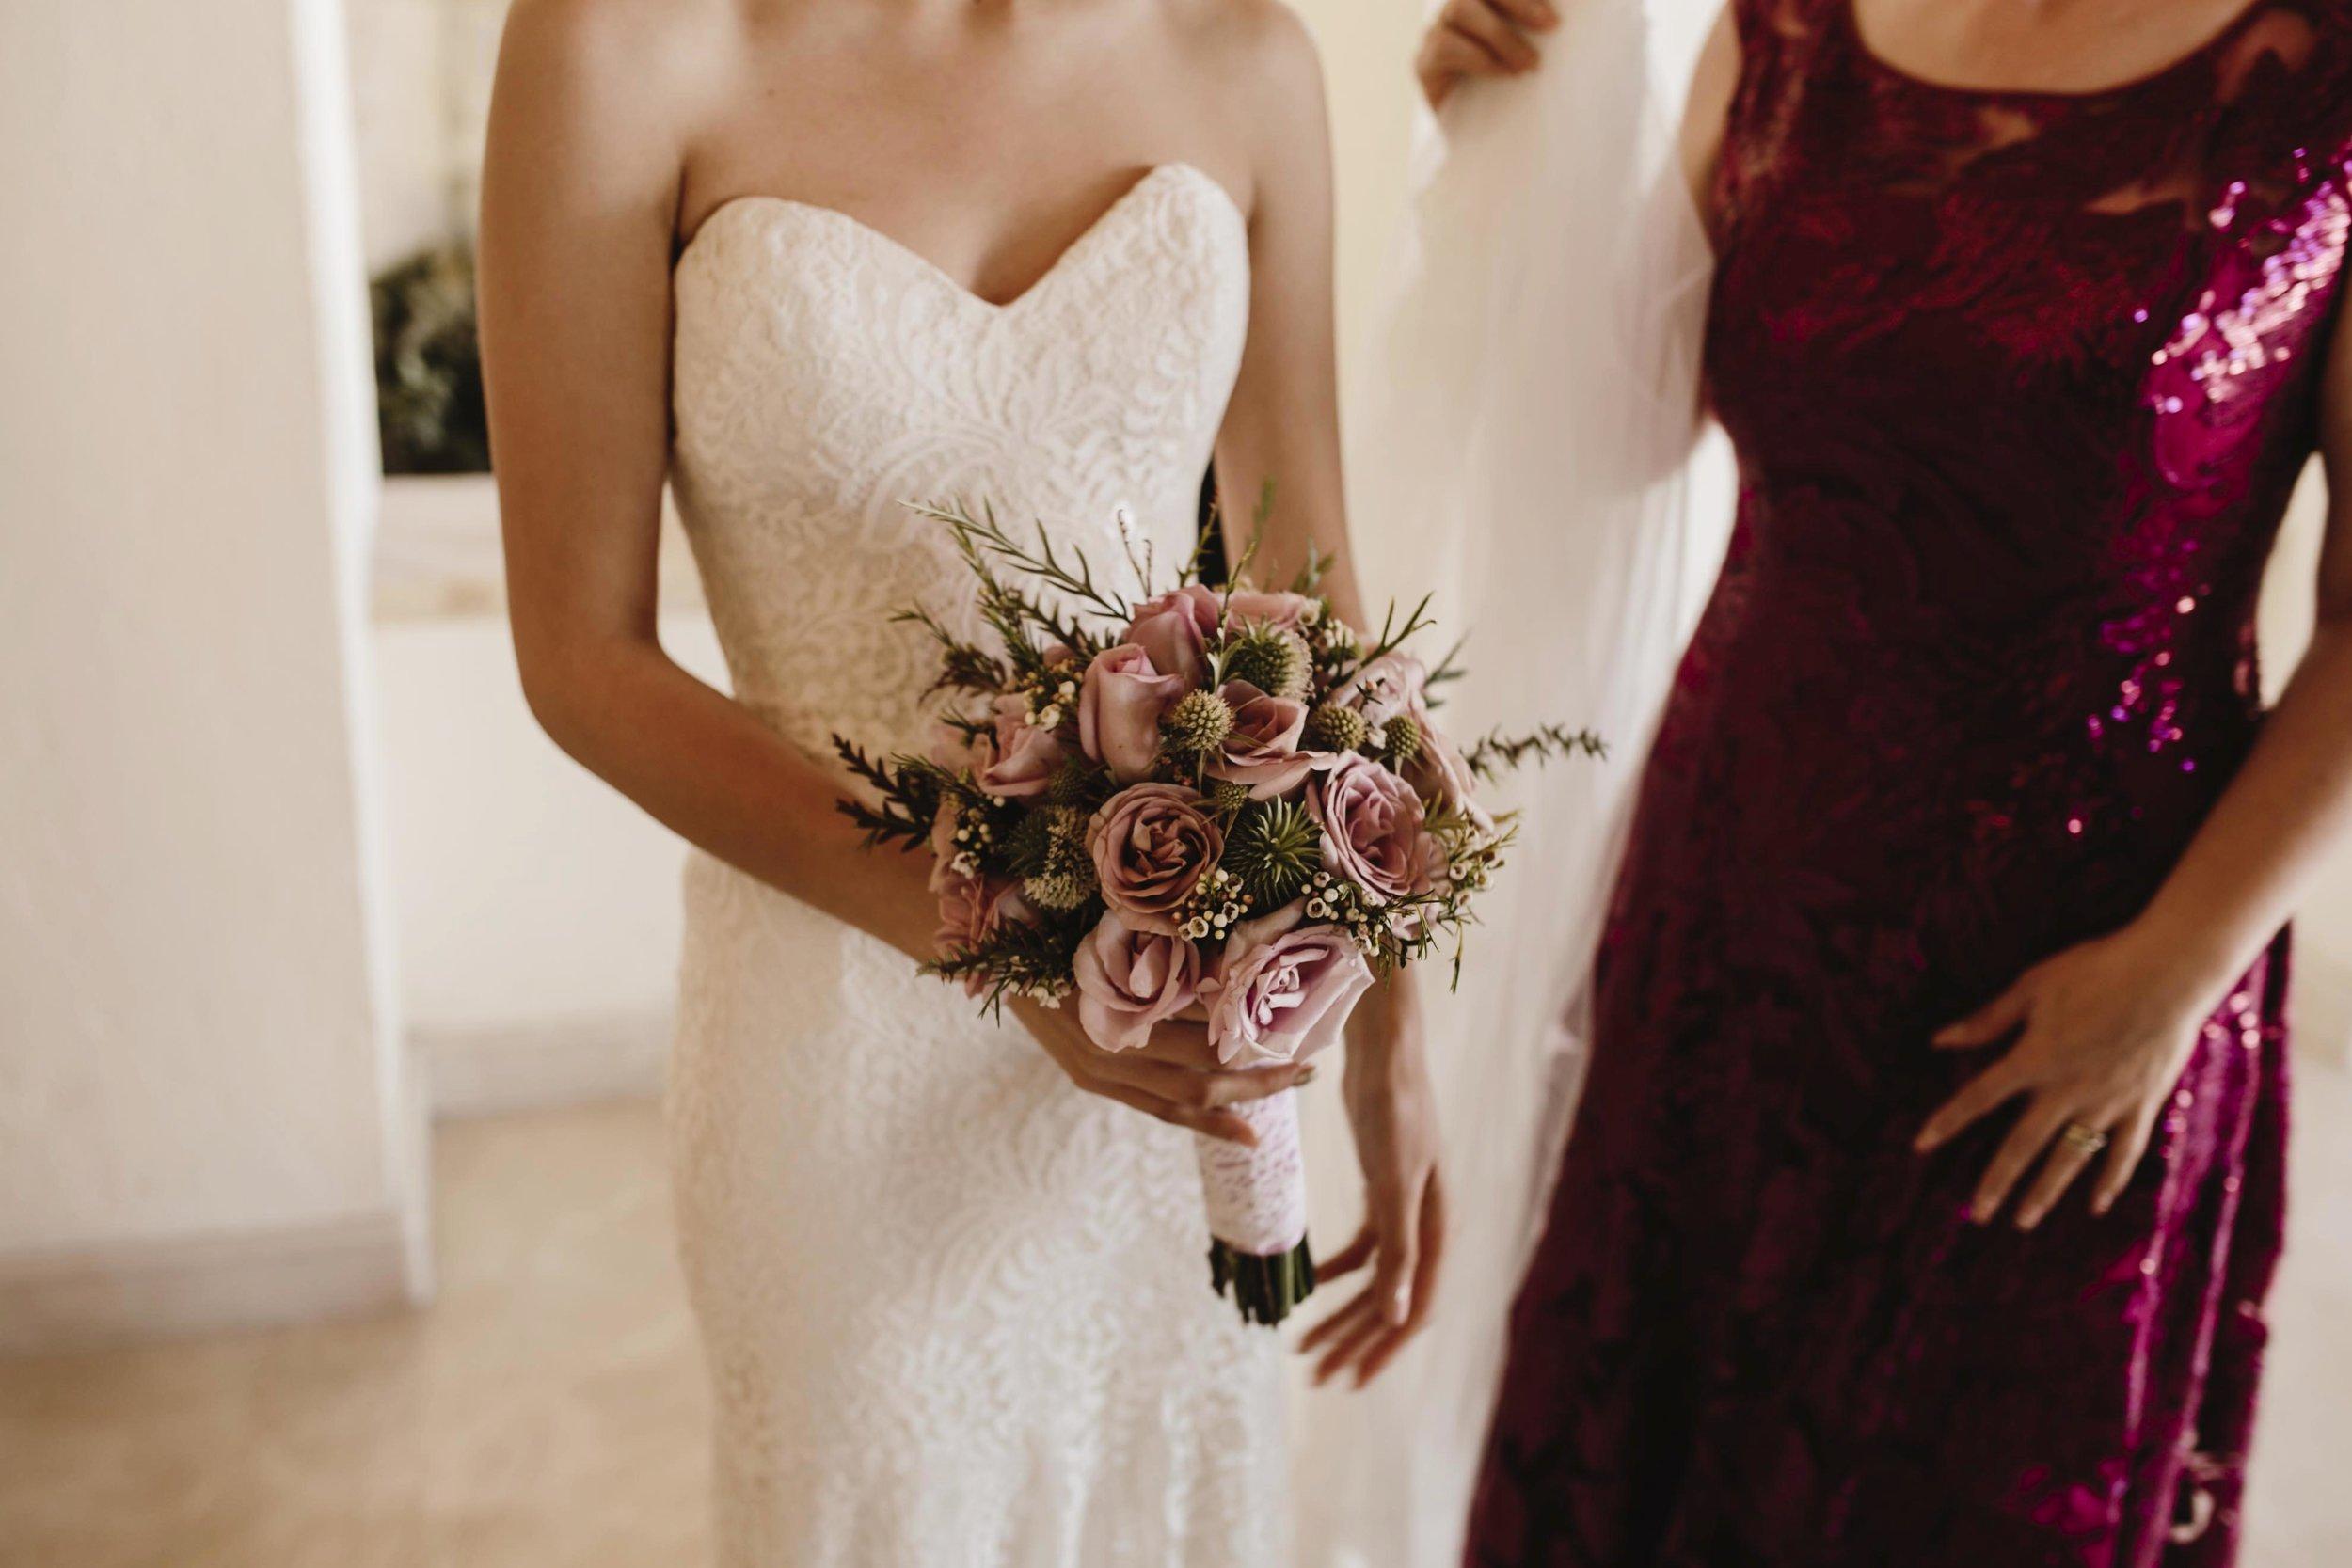 alfonso_flores_destination_wedding_photography_jardin_amarello_cuernavaca51.jpg